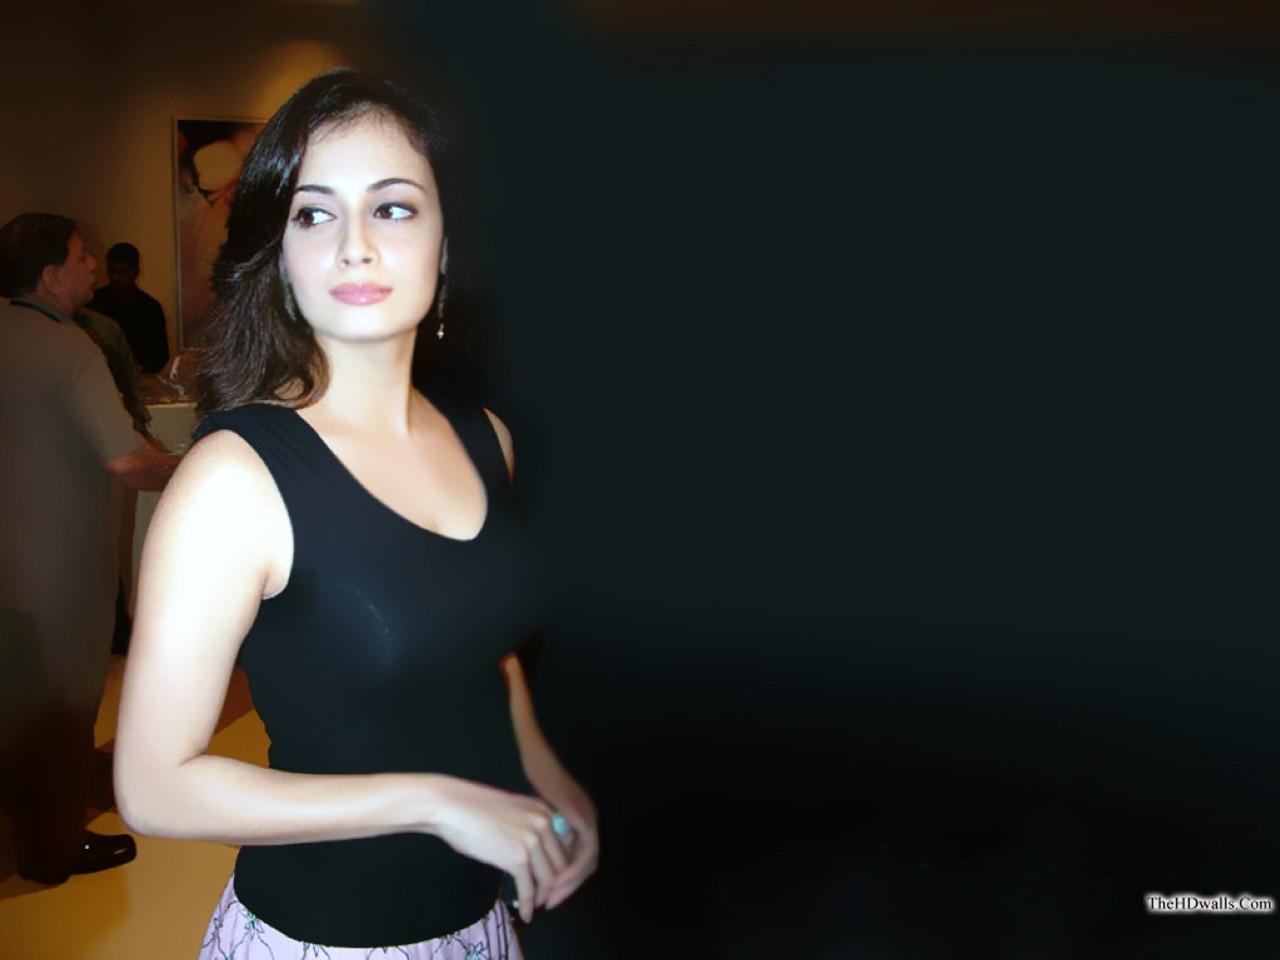 Bollywood Diya Mirza Wallpapers AcjCymV0